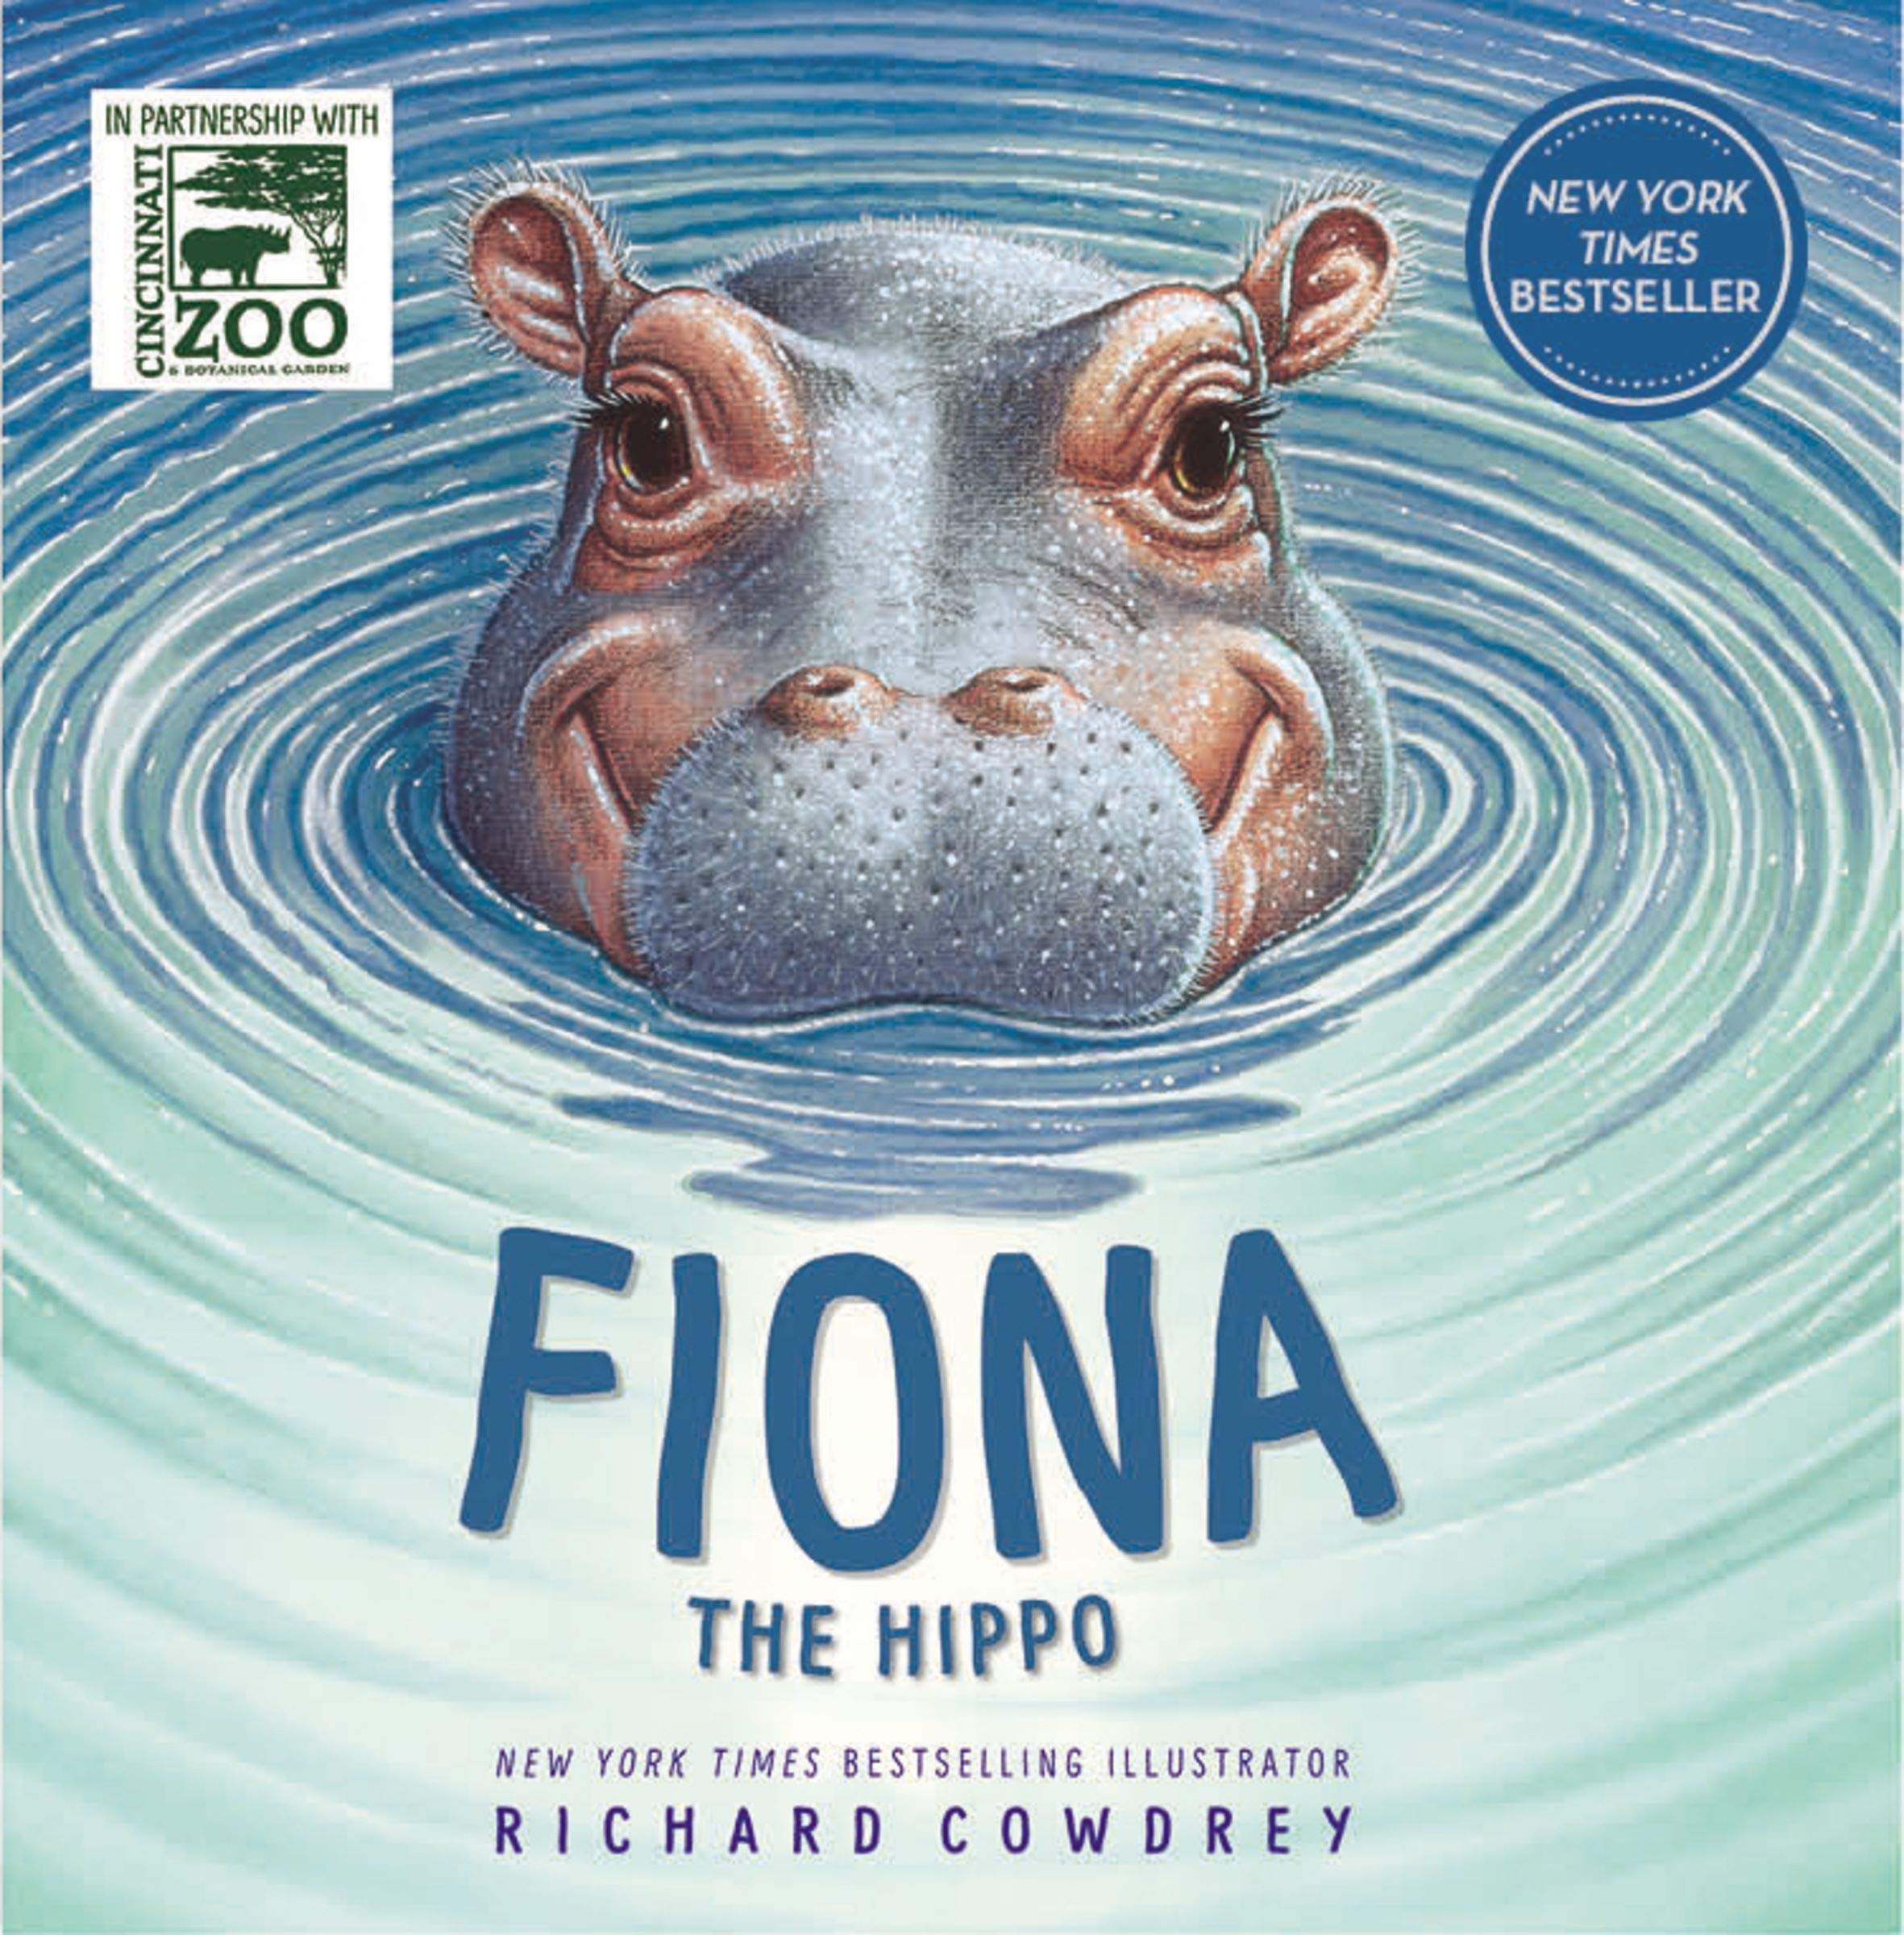 Fiona the Hippo (A Fiona the Hippo Book): Zondervan, Cowdrey, Richard: Amazon.com: Books